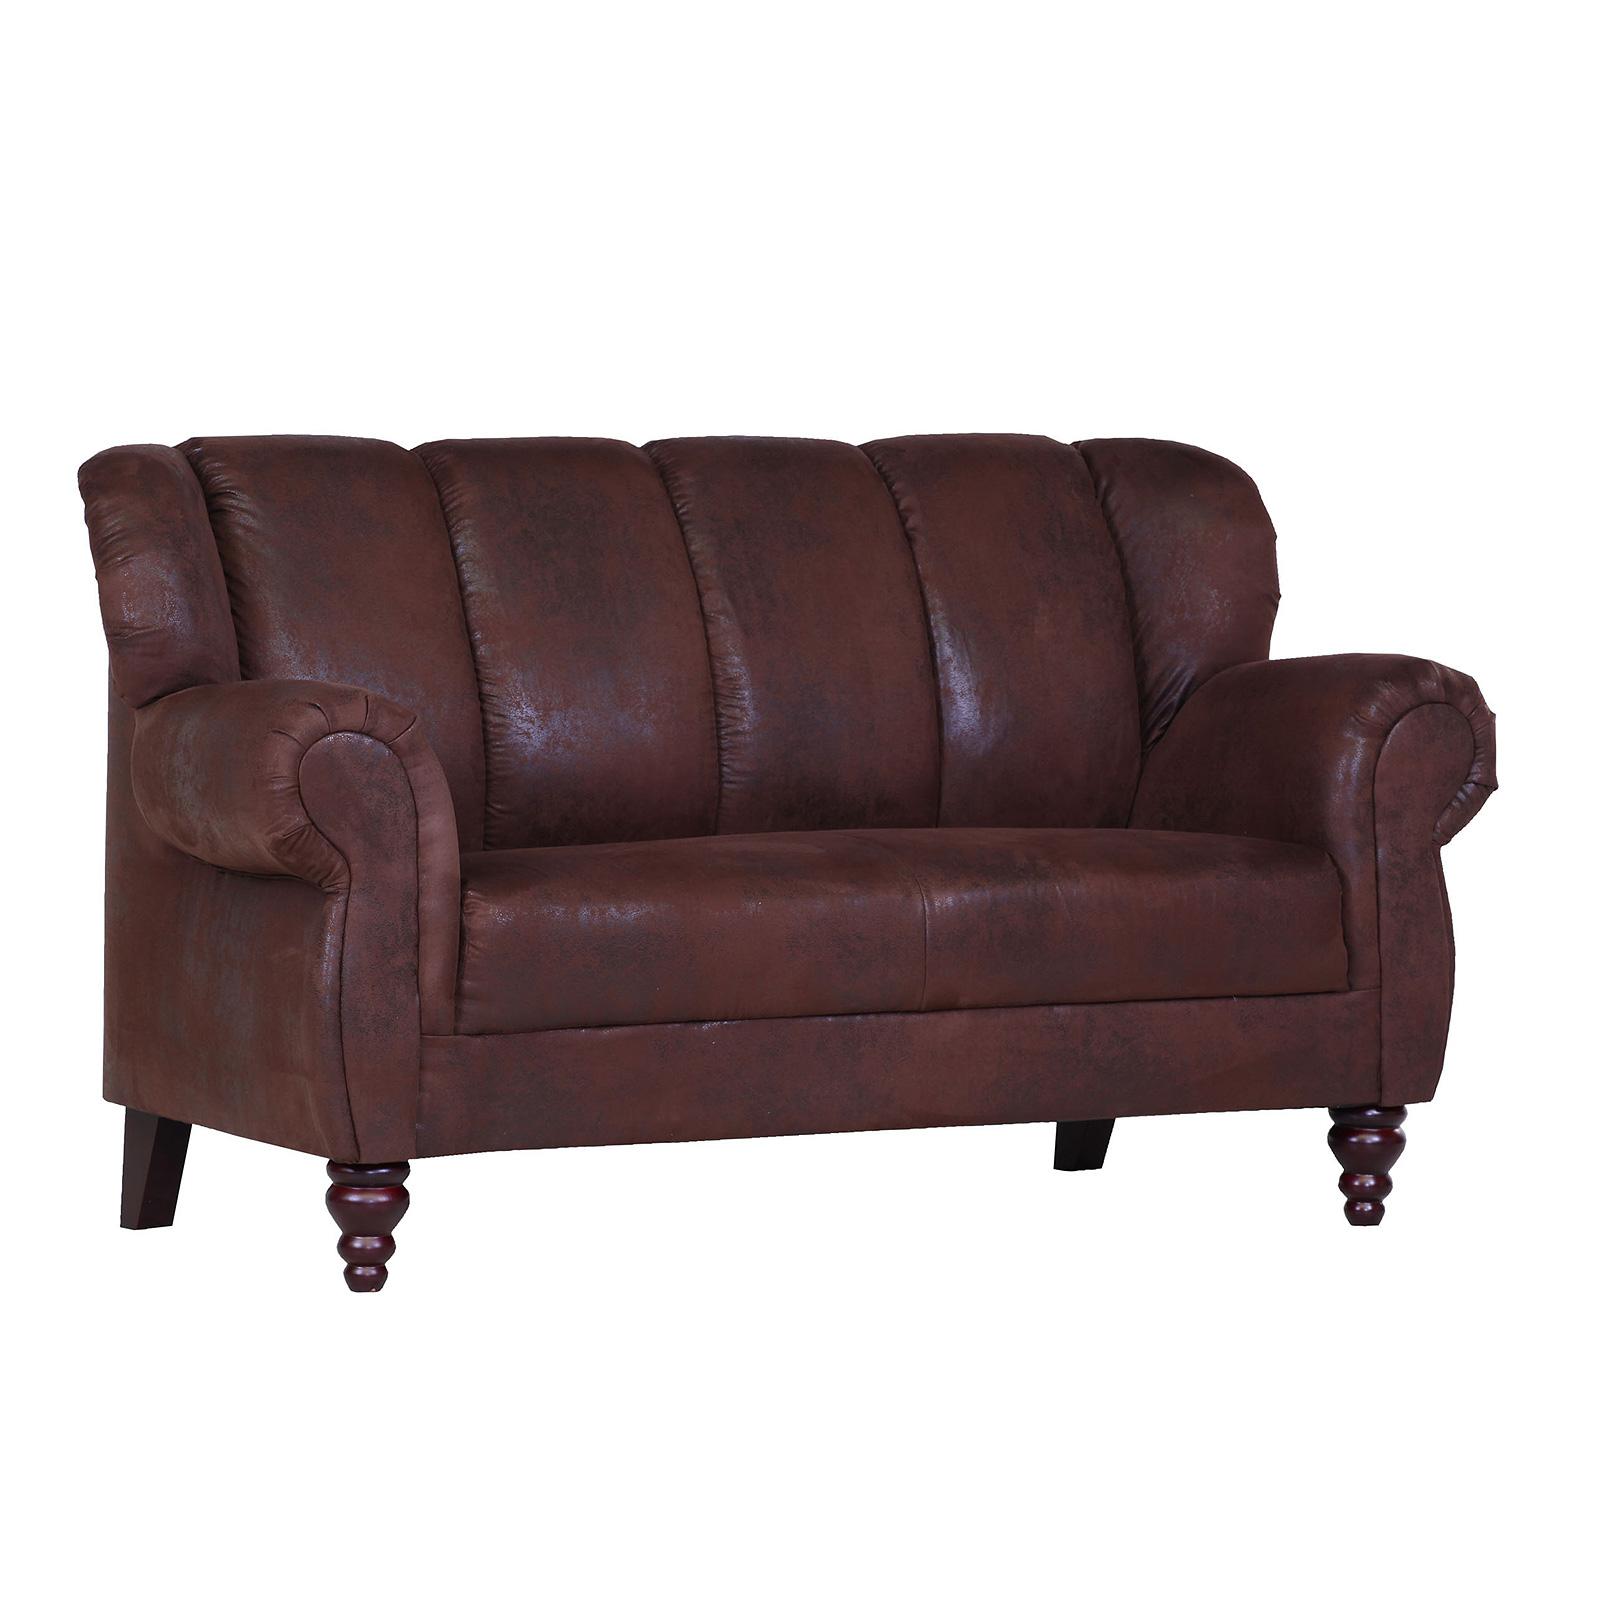 speisesofa dinner 2 sitzer sofa polsterm bel bezug. Black Bedroom Furniture Sets. Home Design Ideas